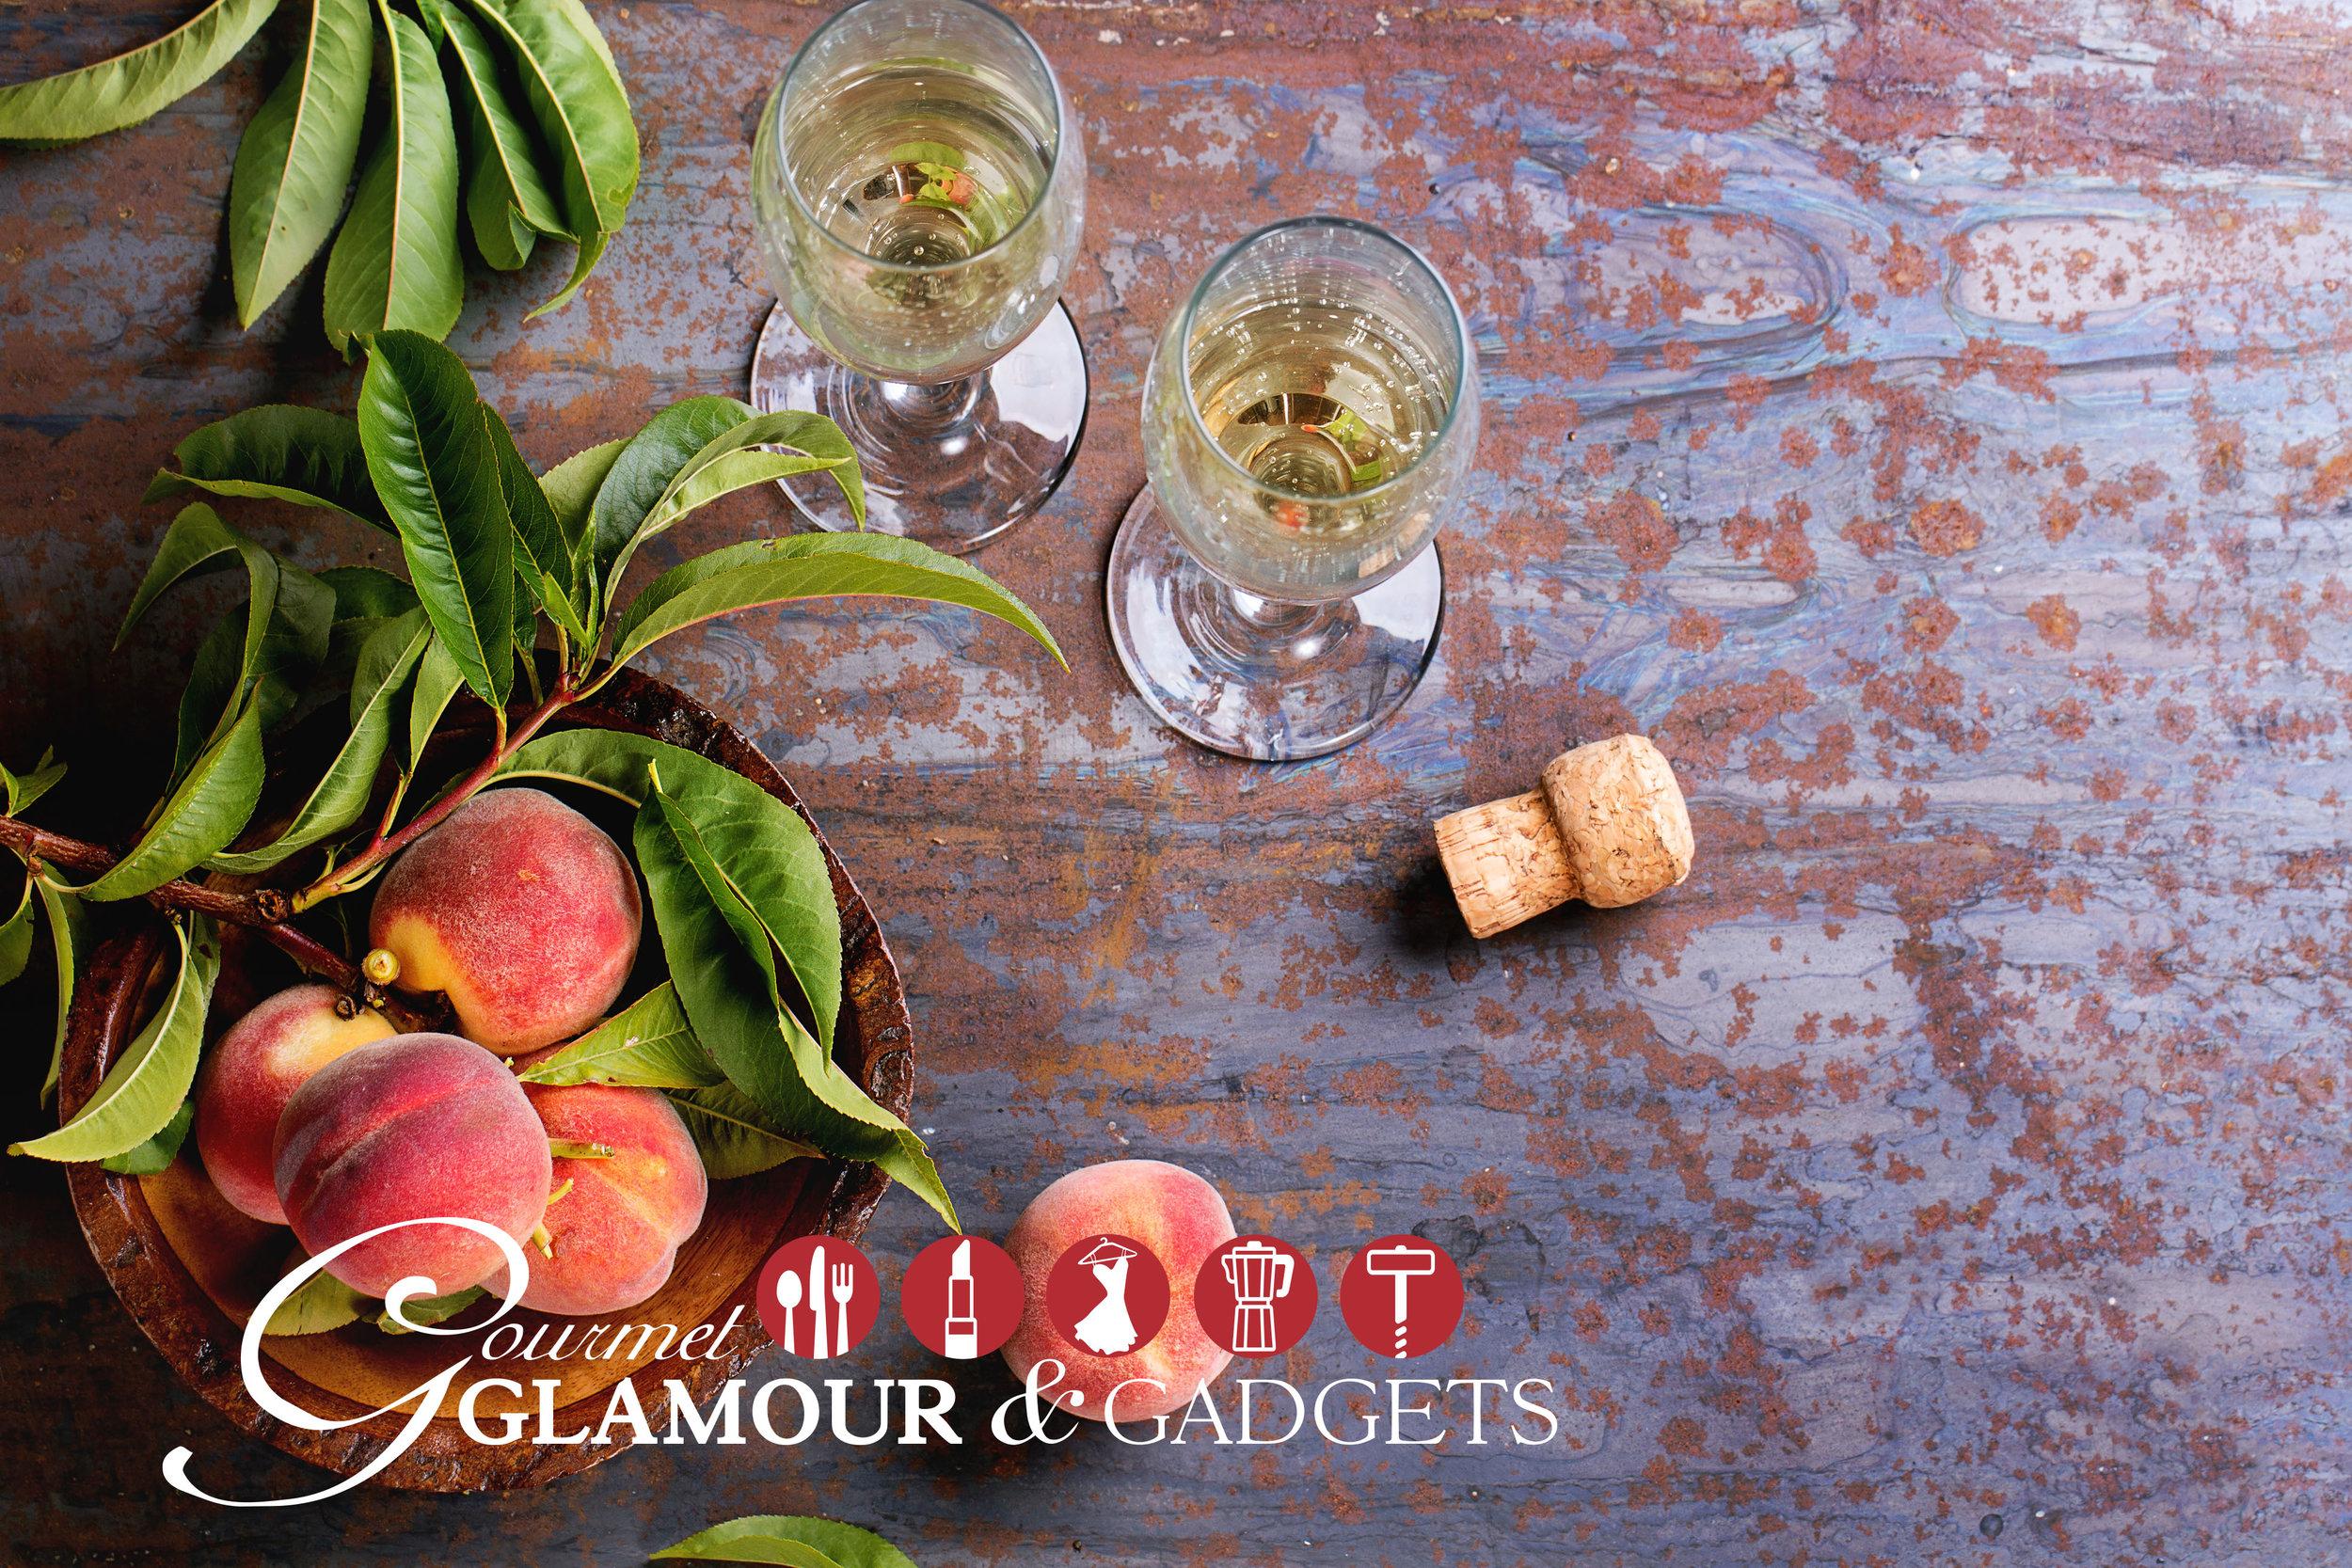 Gourmet Glamour & Gadgets